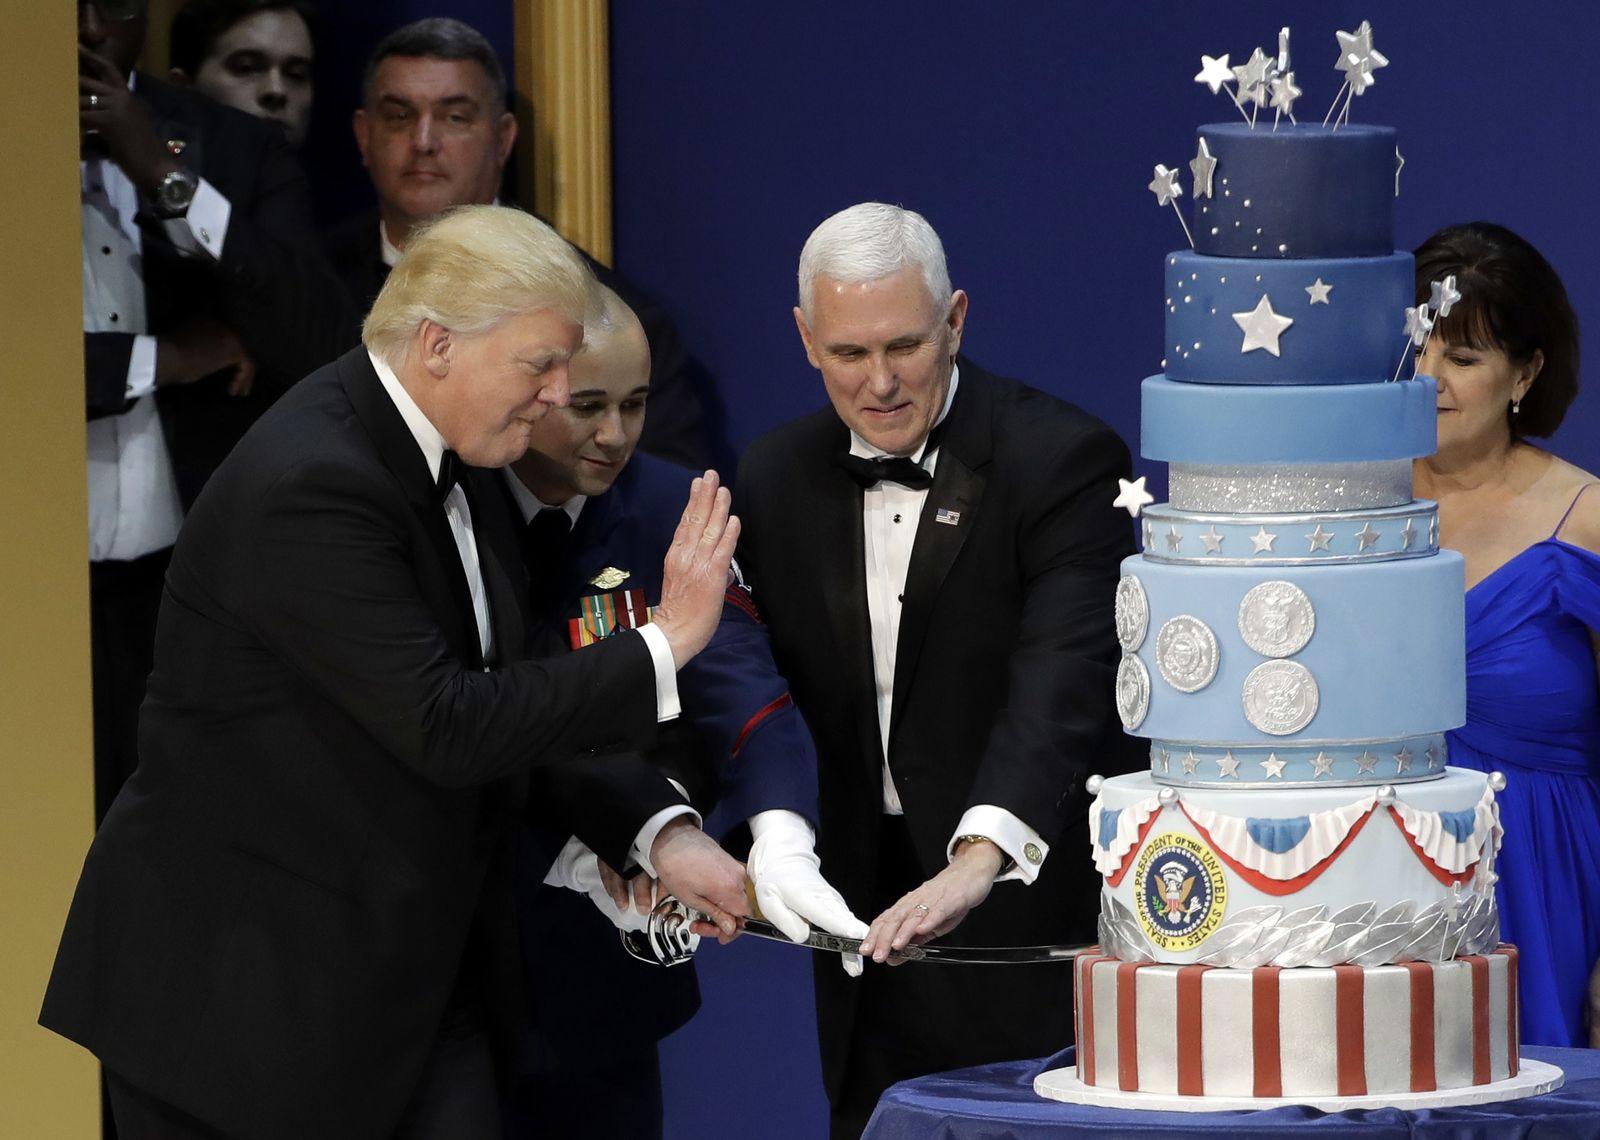 Amtseinführung Trump - Military Ball